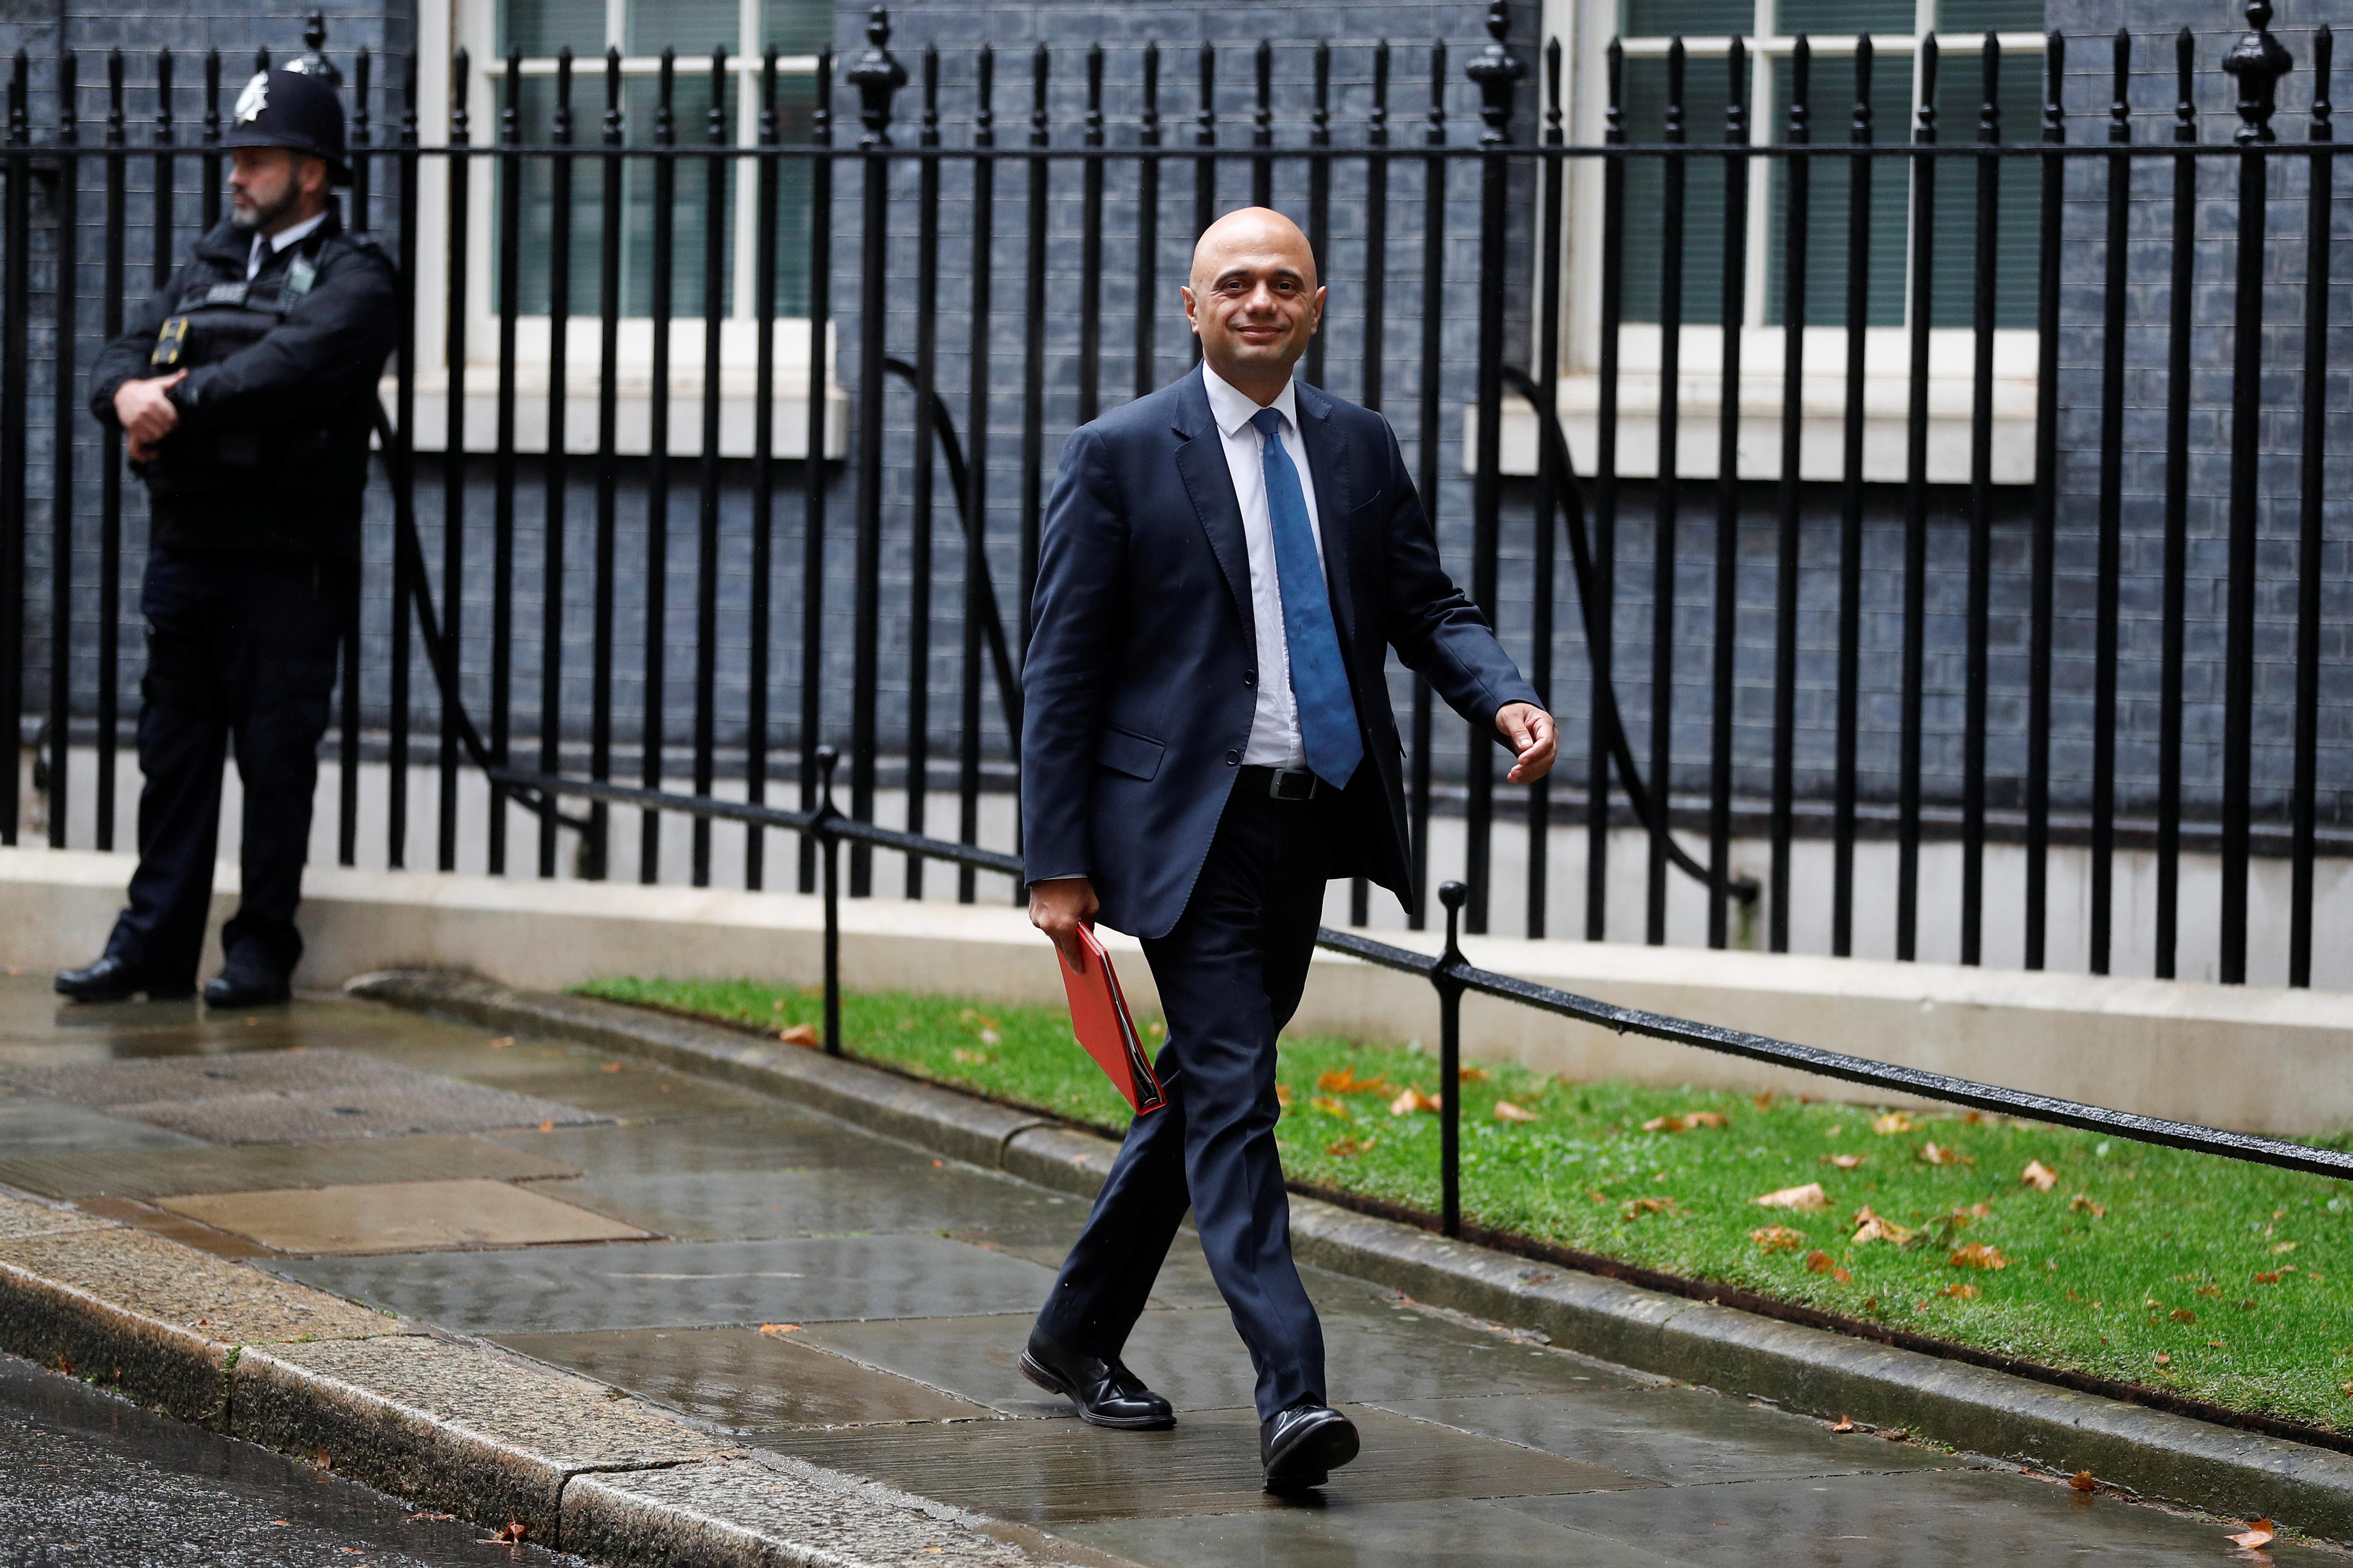 Britain's Health Secretary Sajid Javid walks outside Downing Street in London, Britain, September 14, 2021. REUTERS/Peter Nicholls